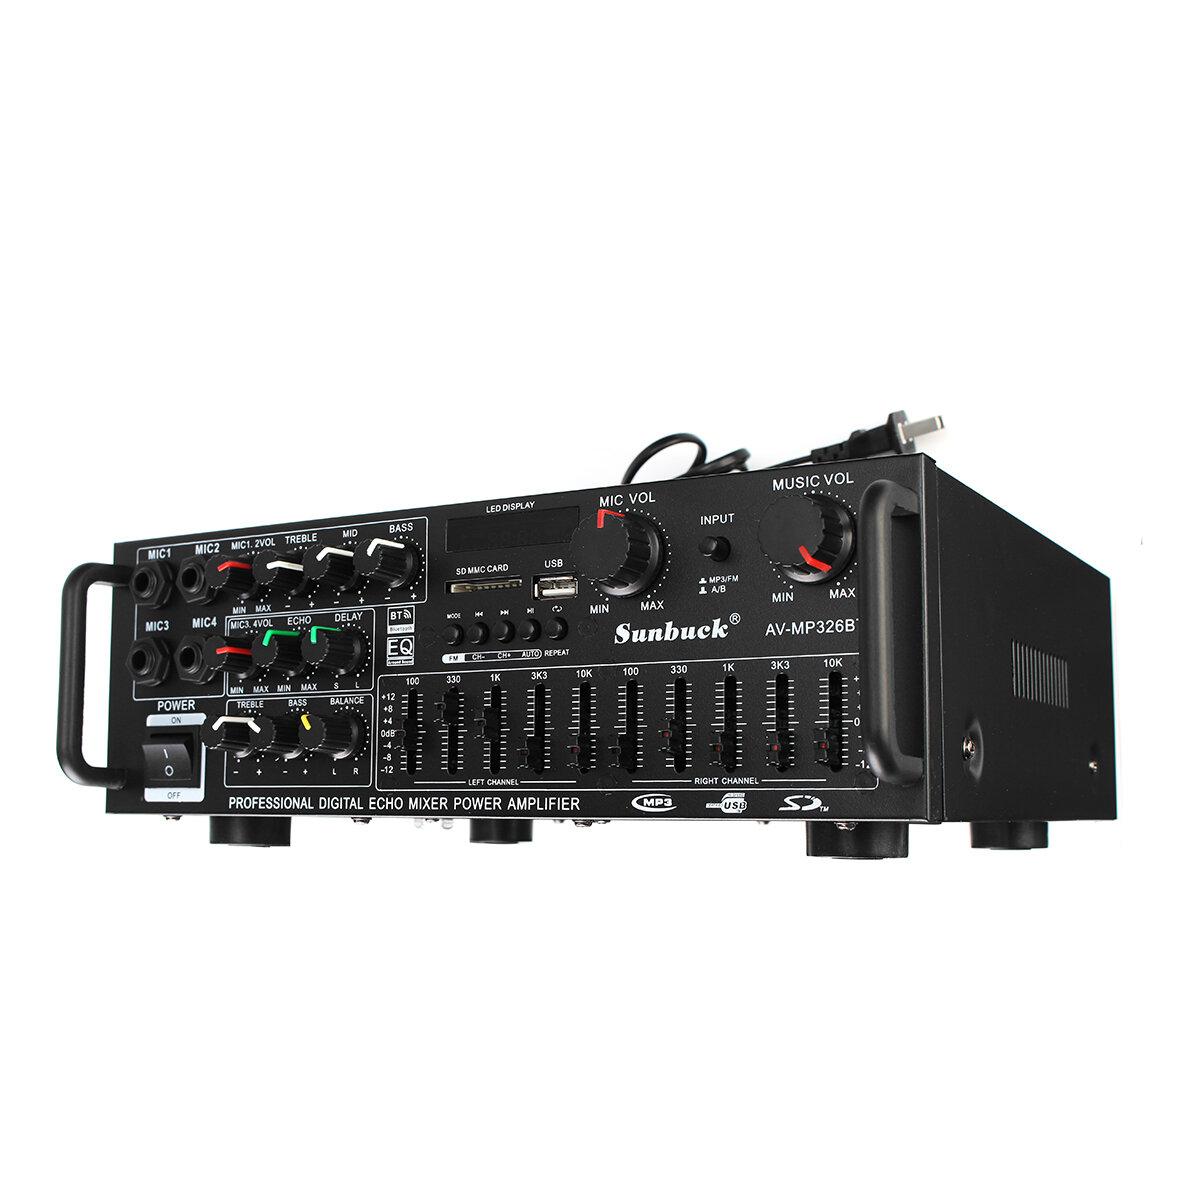 Sunbuck AV-MP326BT 220V 800W 4 ohm 2CH EQ Bluetooth Supporto amplificatore stereo USB Disk SD Card